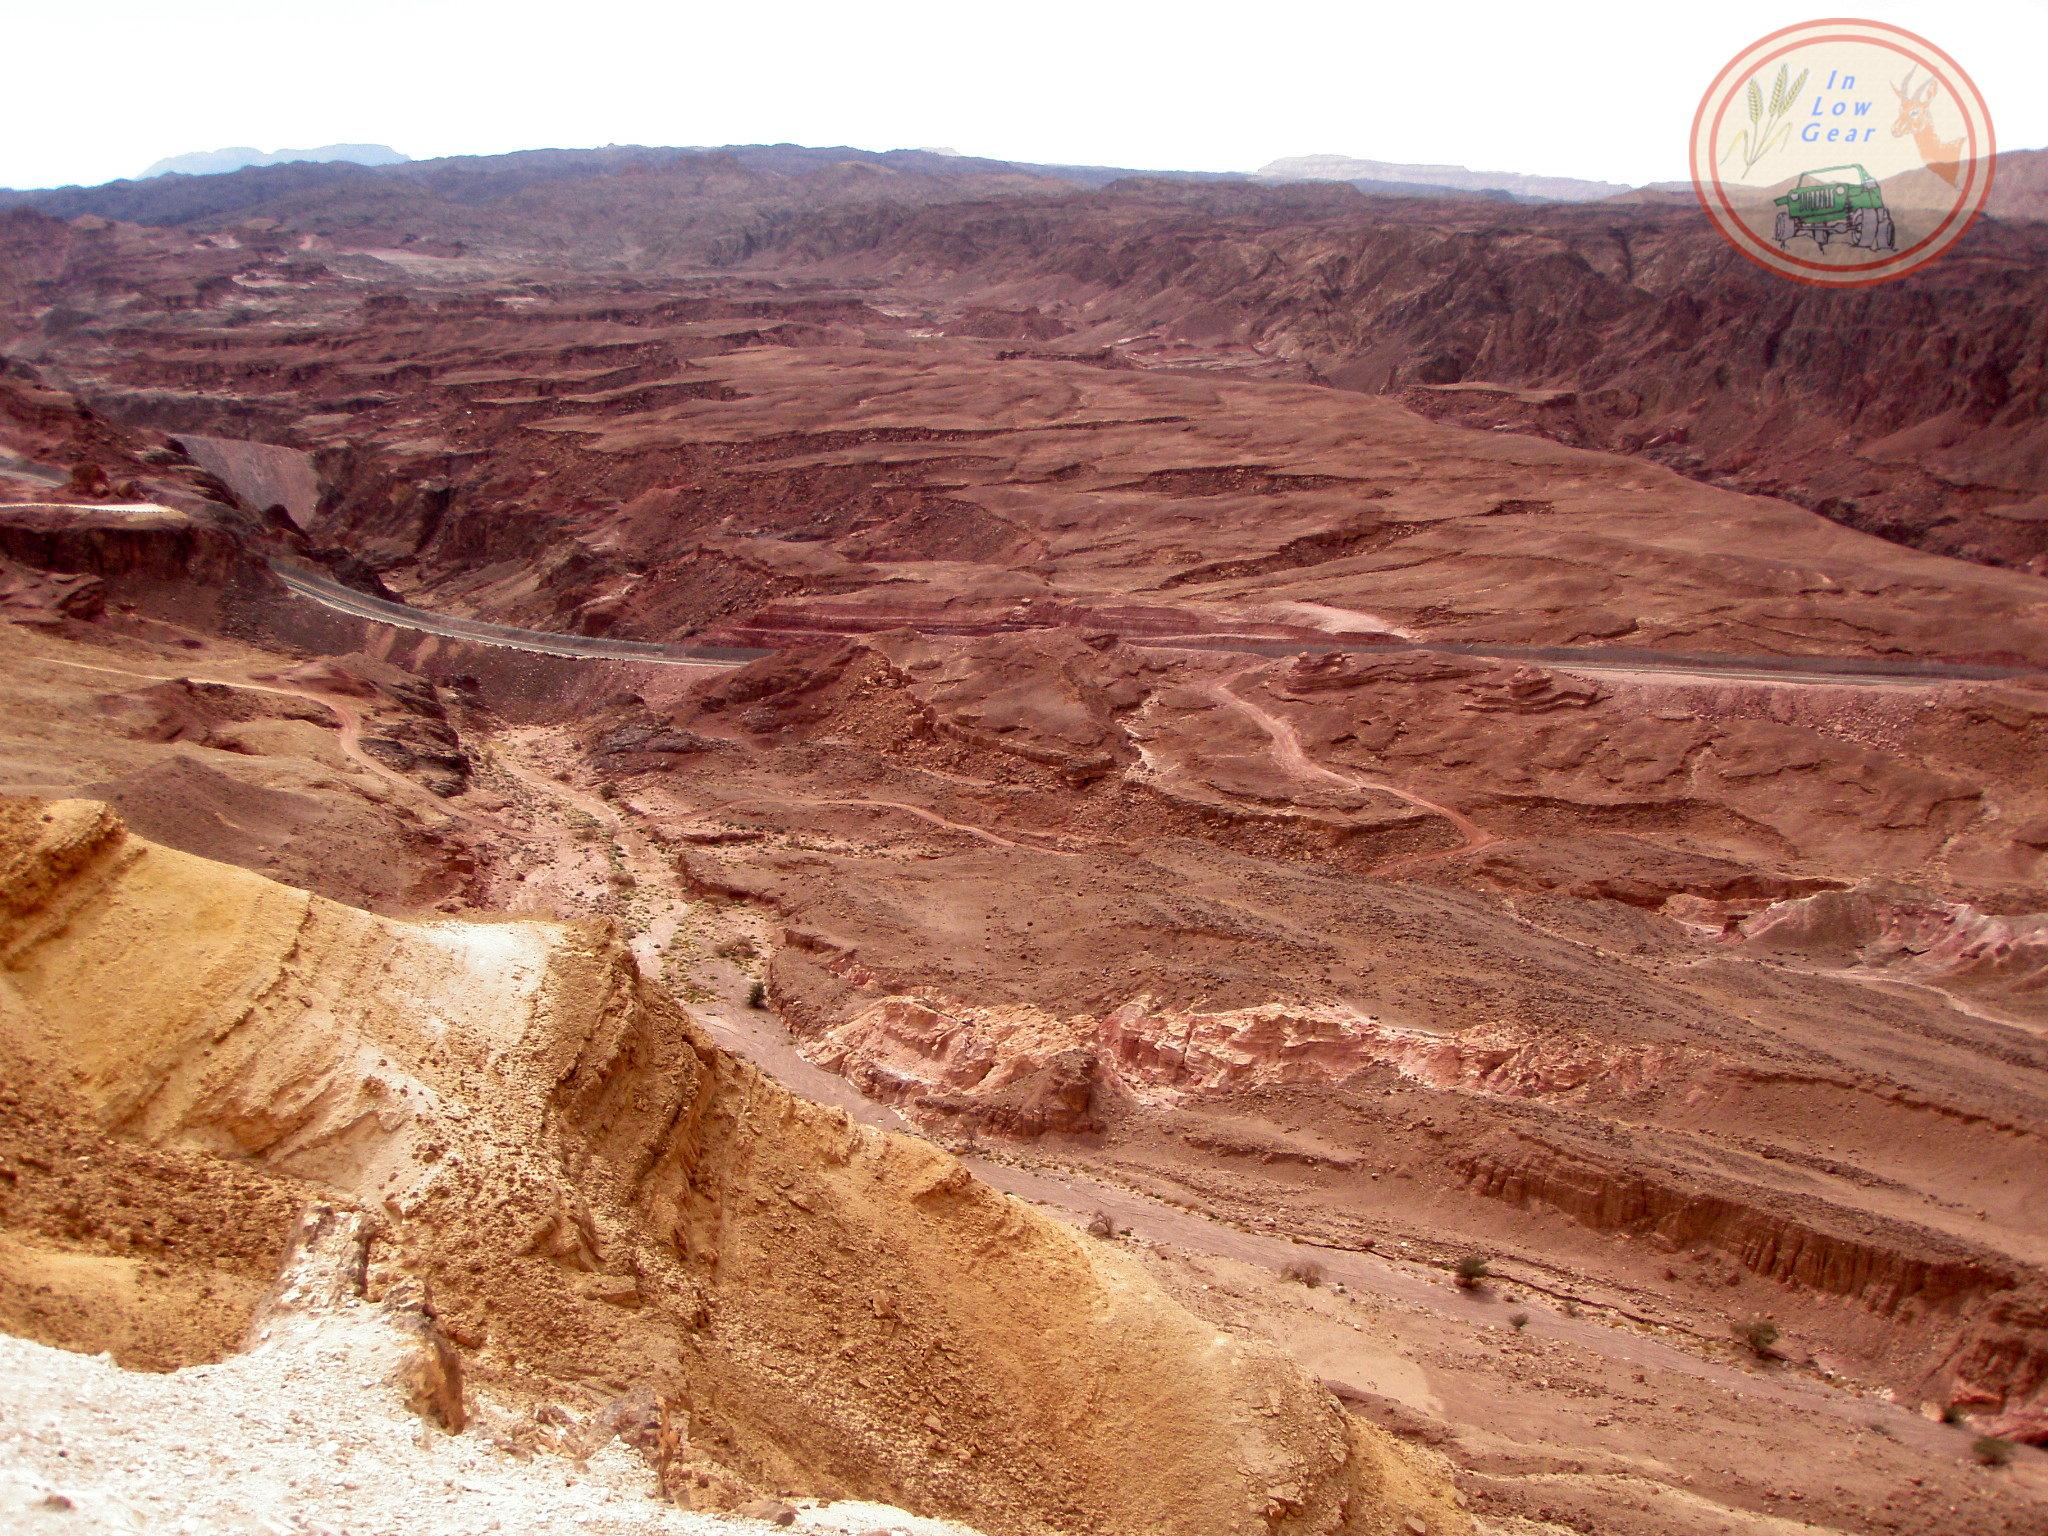 Sini, Wadi Taba סיני, ואדי טאבא